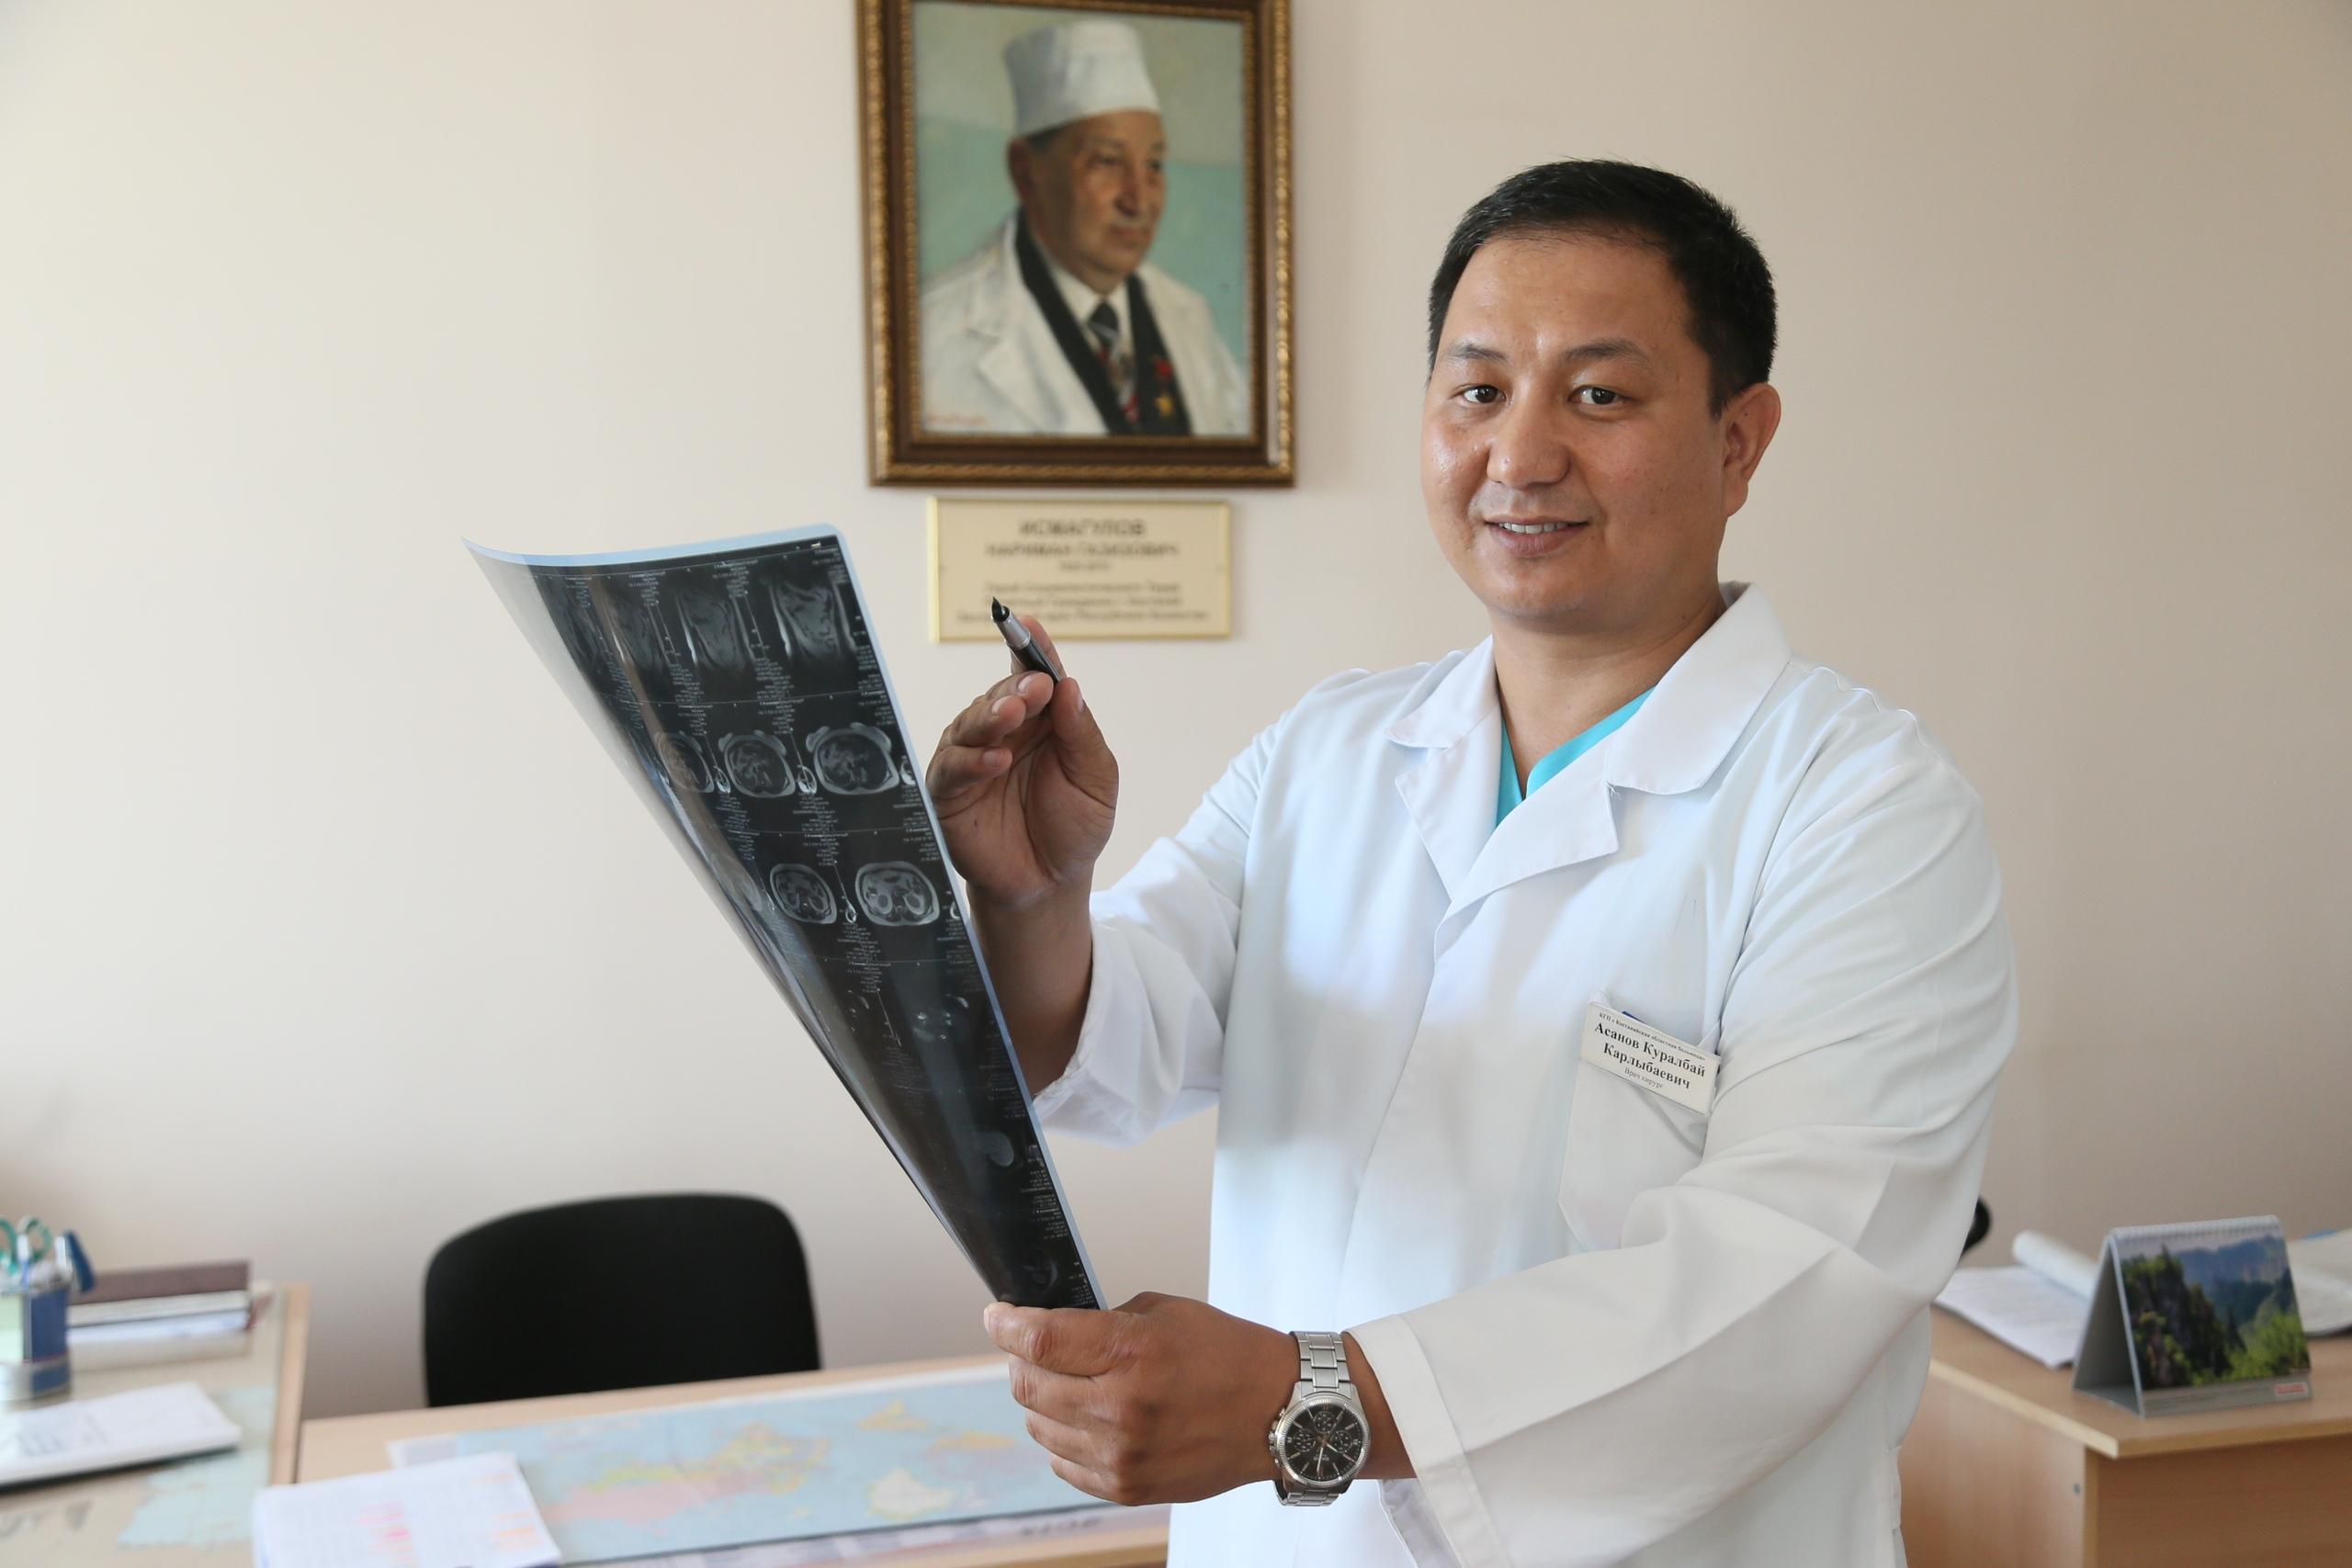 snyal-na-sotoviy-osmotr-u-hirurga-zhenshini